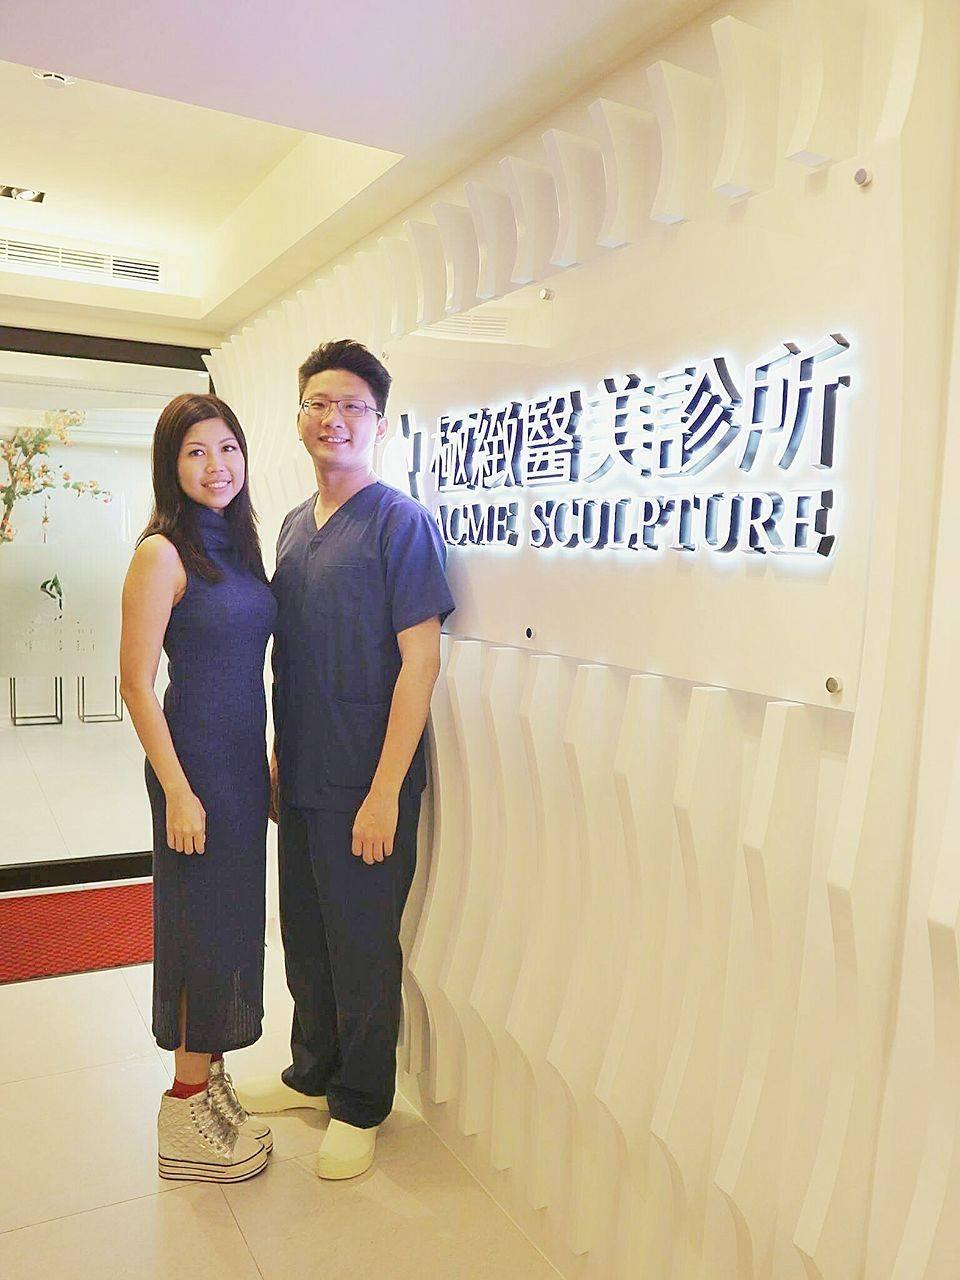 Origins asian restaurant fort lauderdale